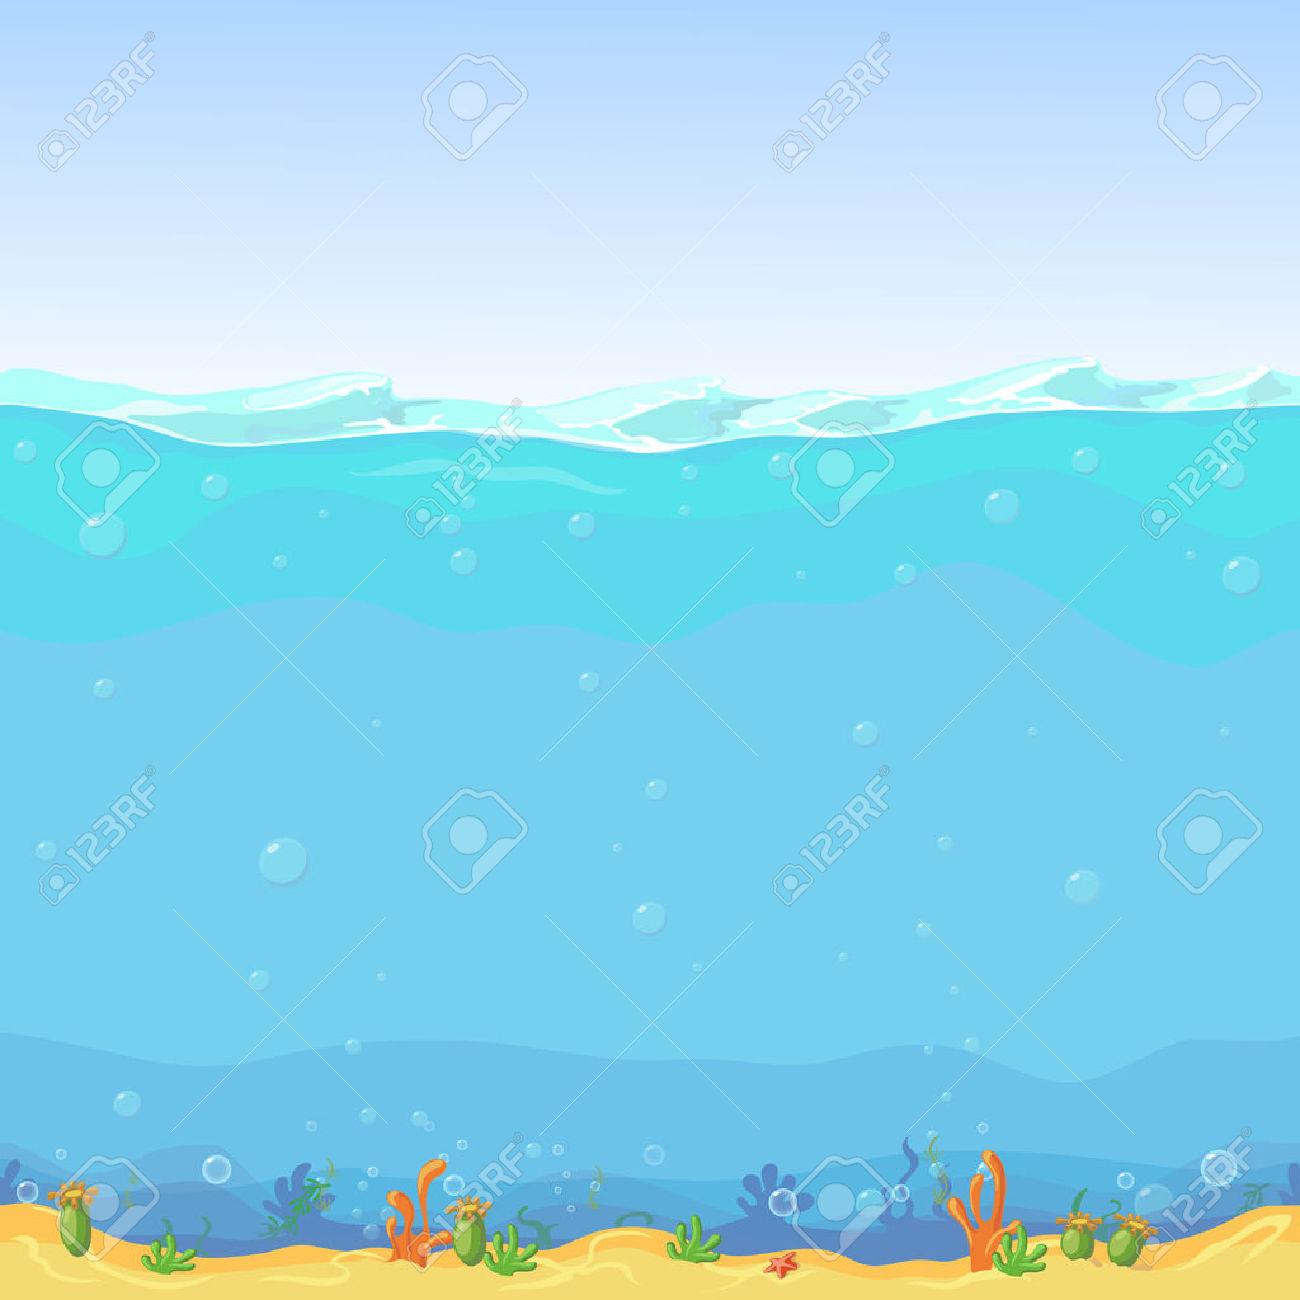 fondos de agua fondos de pantalla seahorse clip art for preschoolers seahorse clip art images